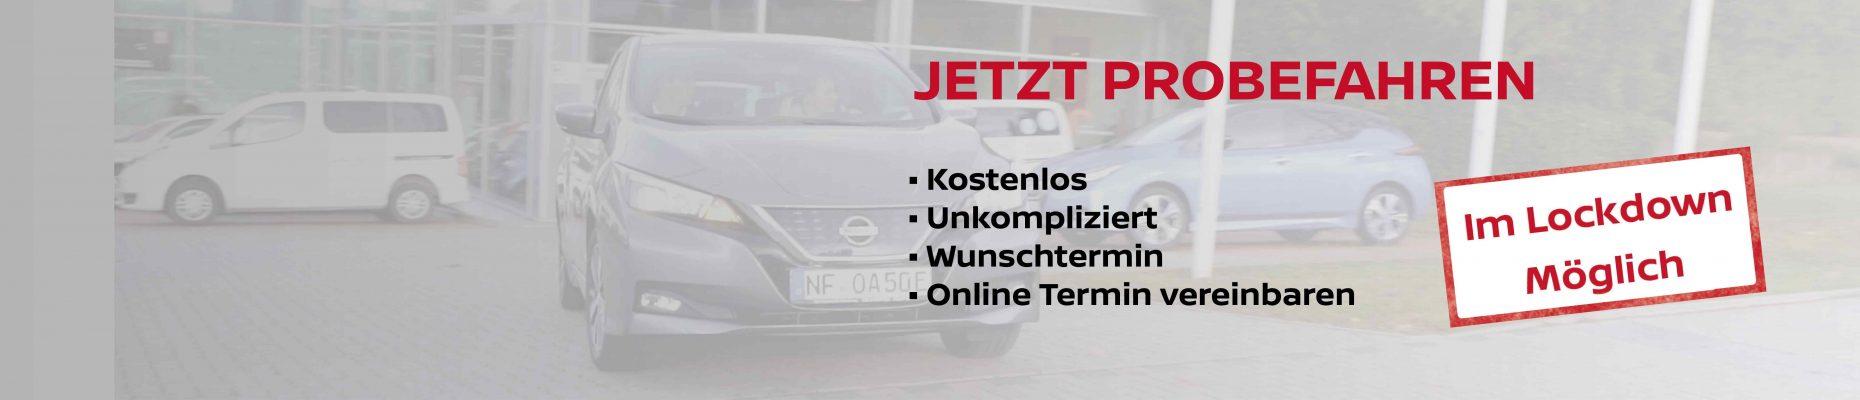 1864x400_Probefahrt3